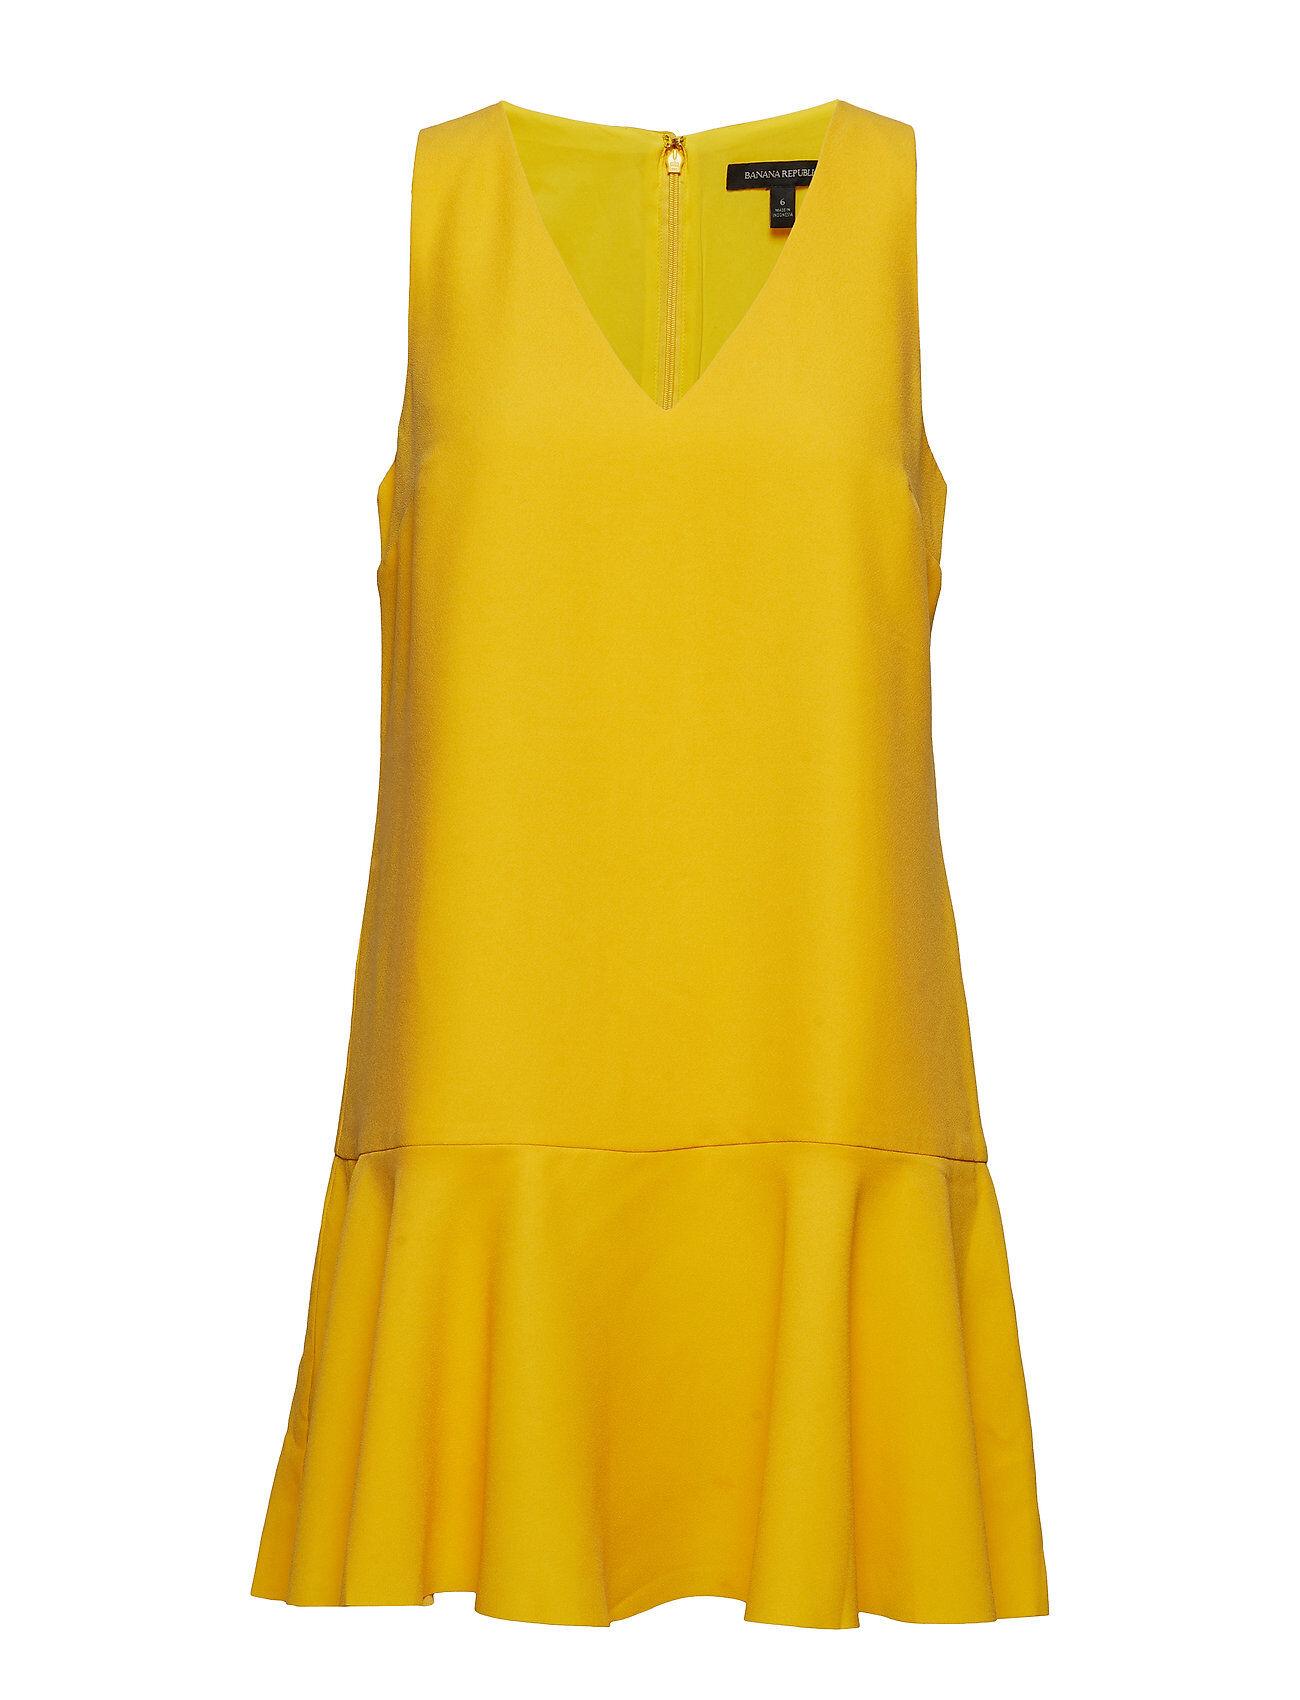 Image of Banana Republic Drop-Waist Shift Dress Lyhyt Mekko Keltainen Banana Republic